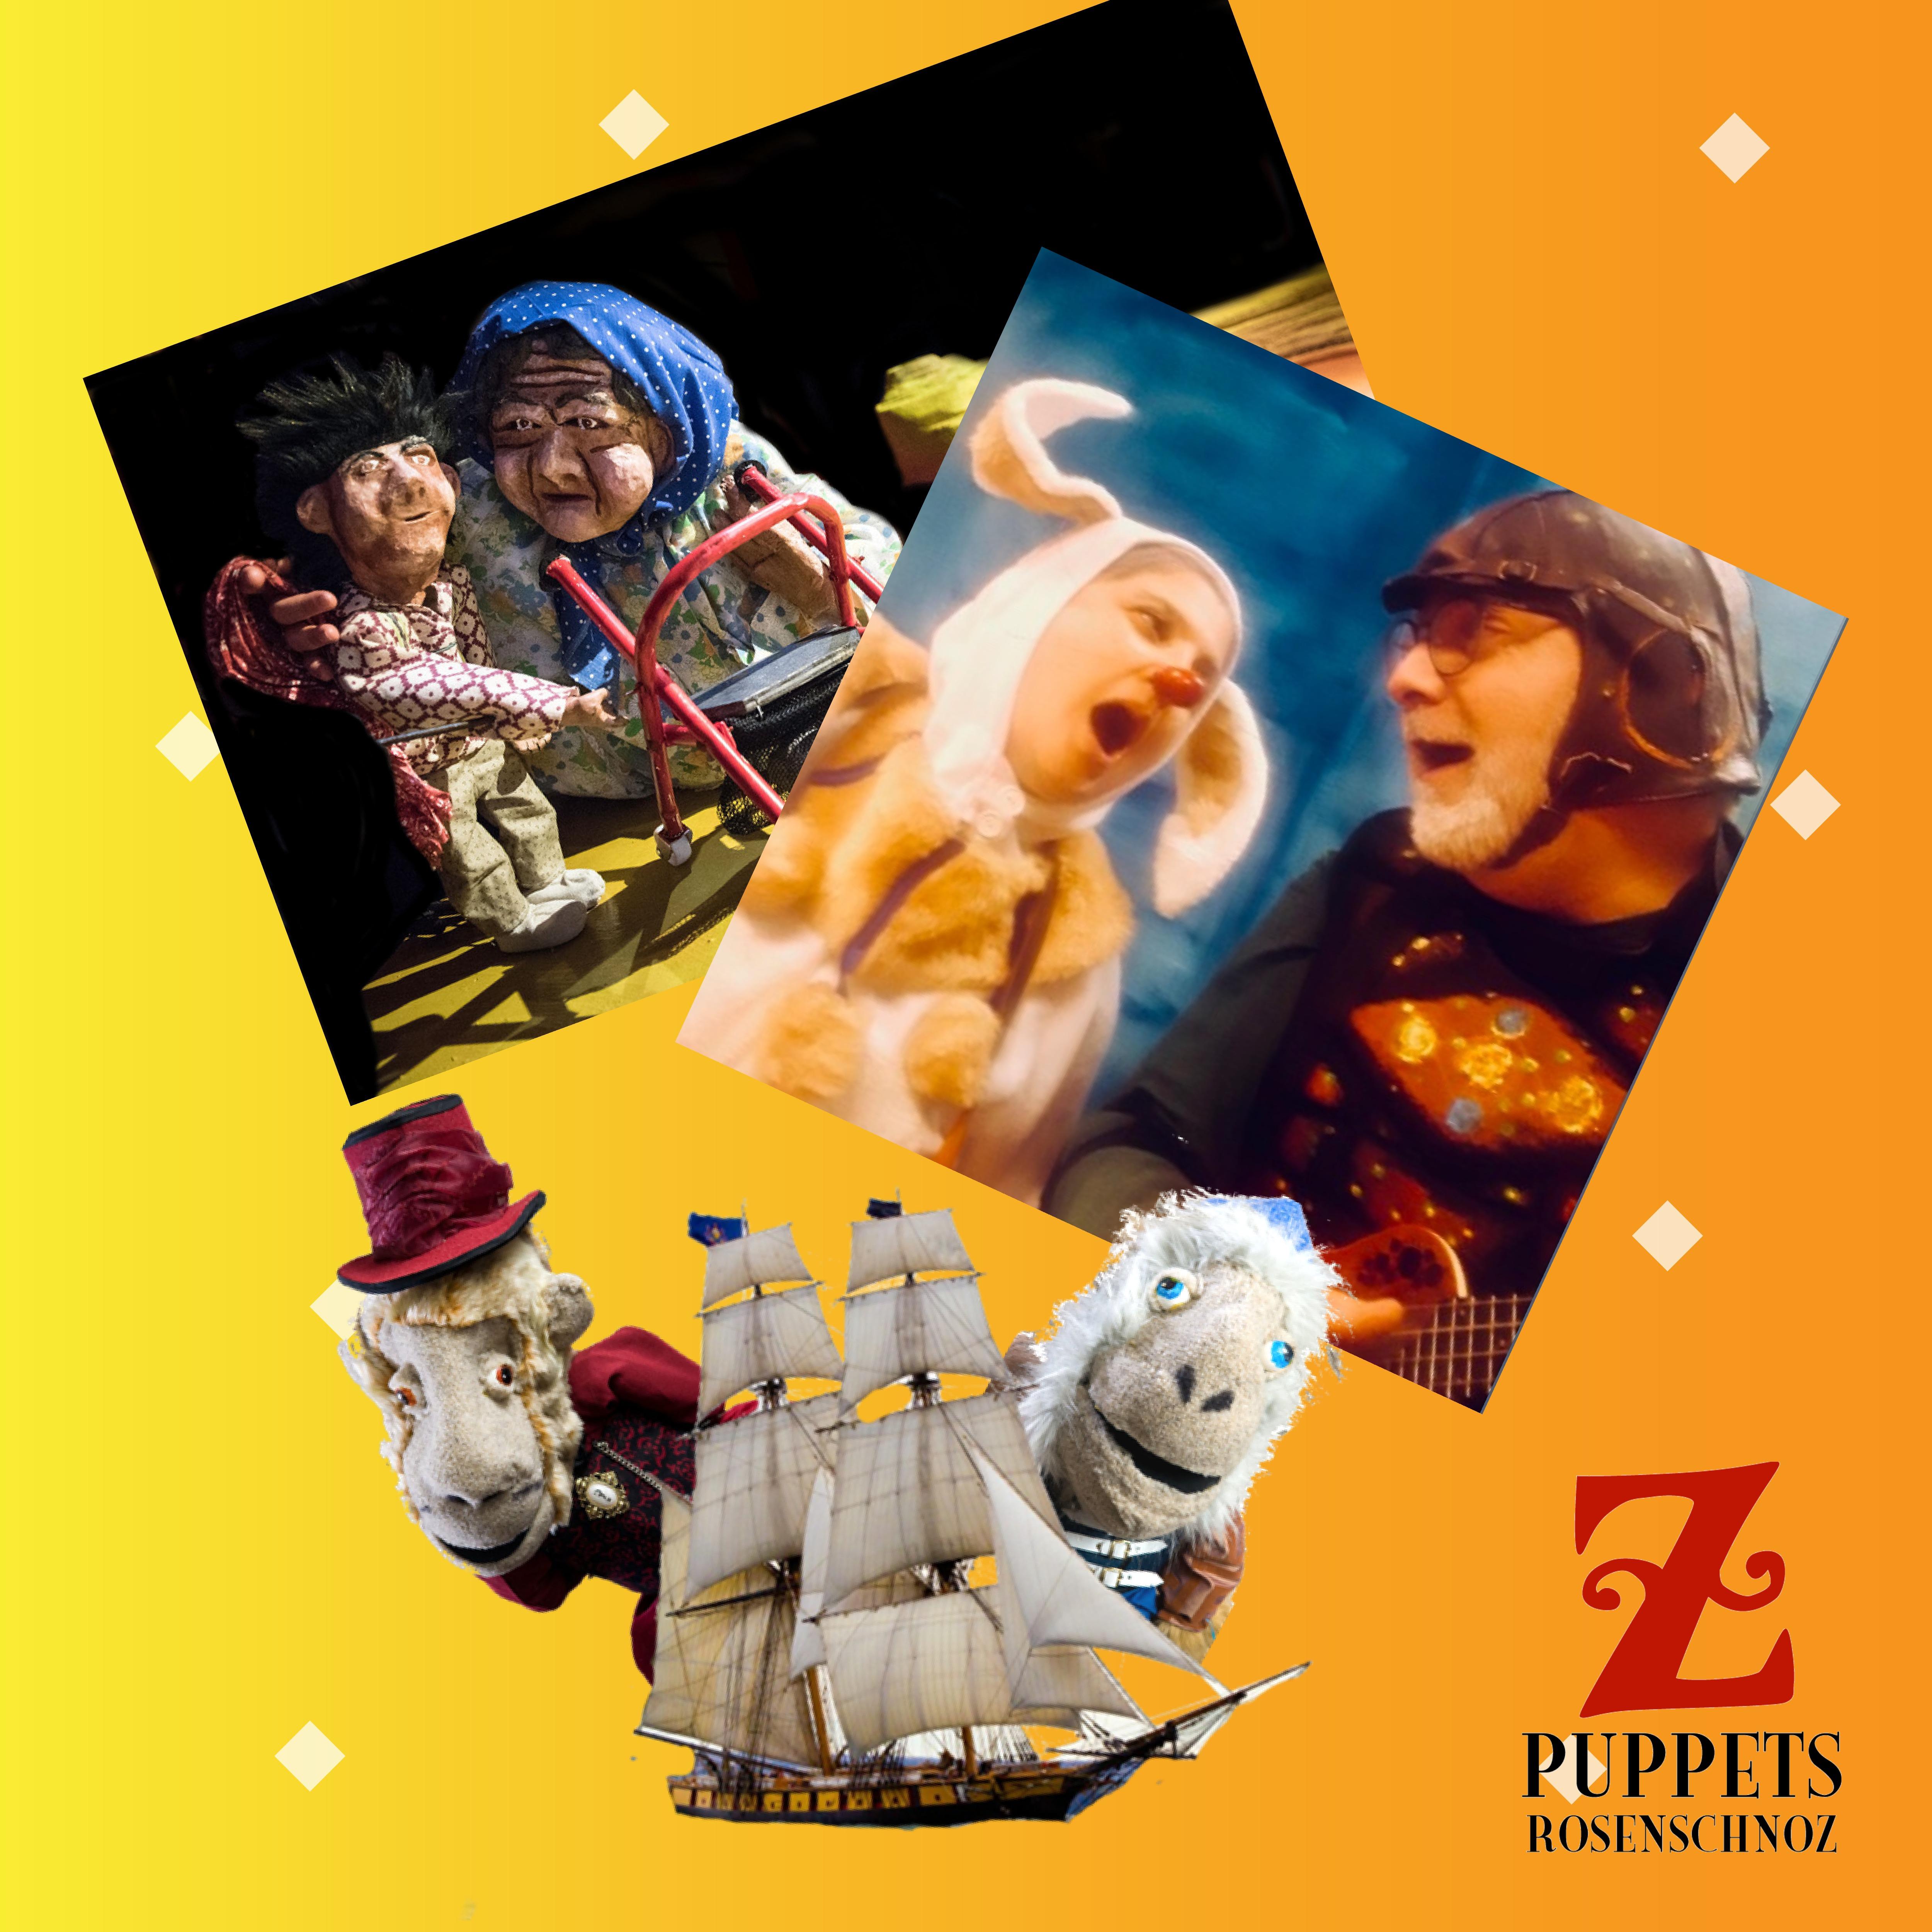 The Secret Life of Puppets - Z Puppets Rosenschnoz - Live via Zoom